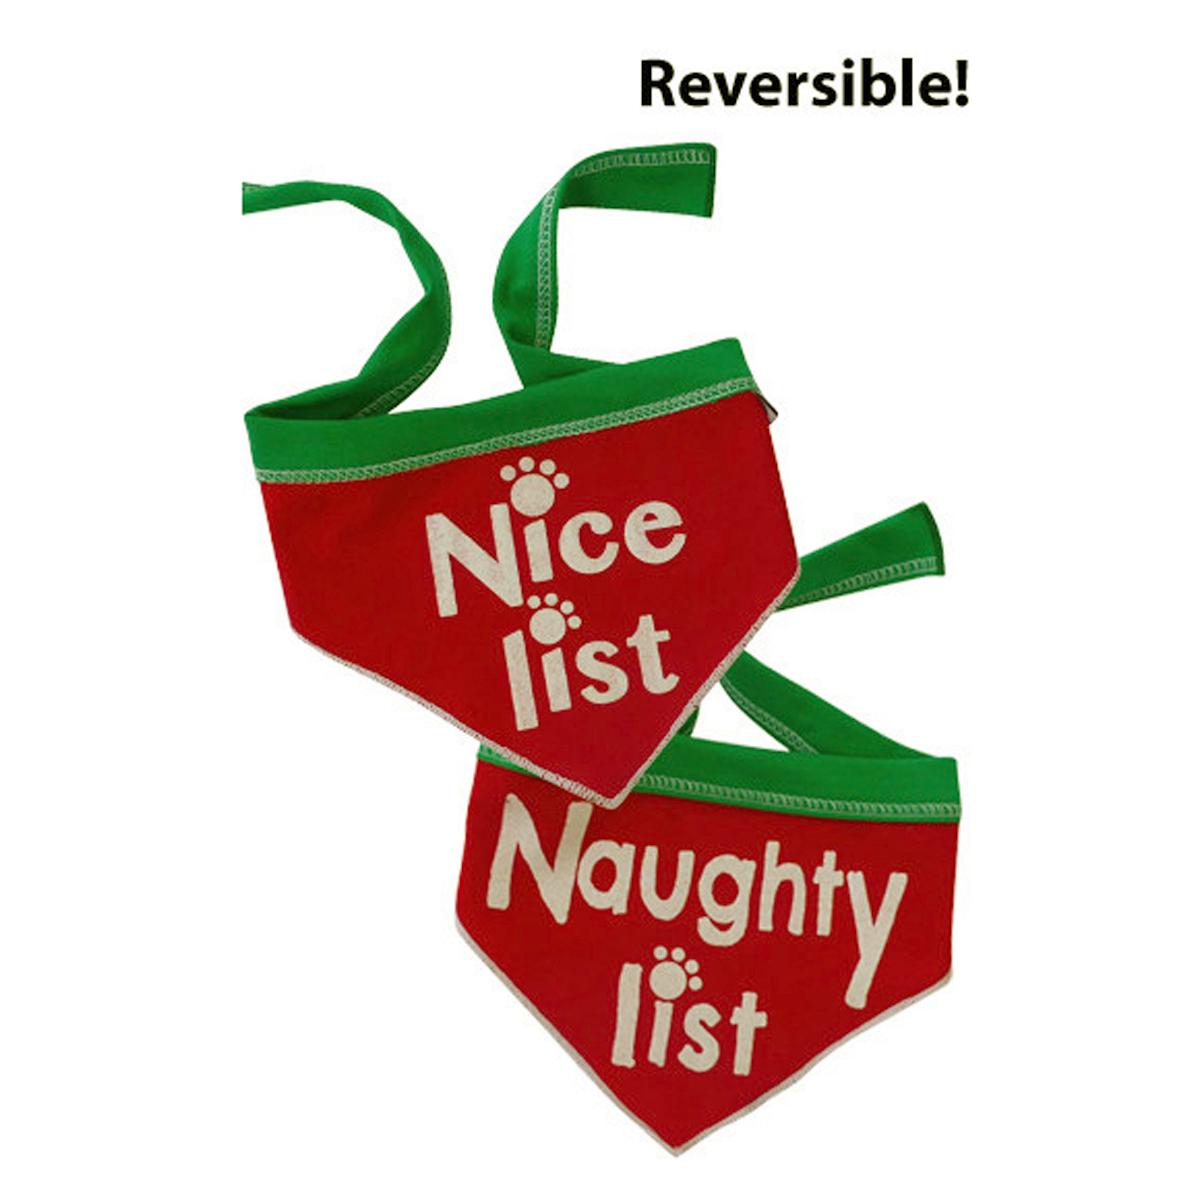 Naughty List/ Nice List Reversible Dog Bandana Scarf